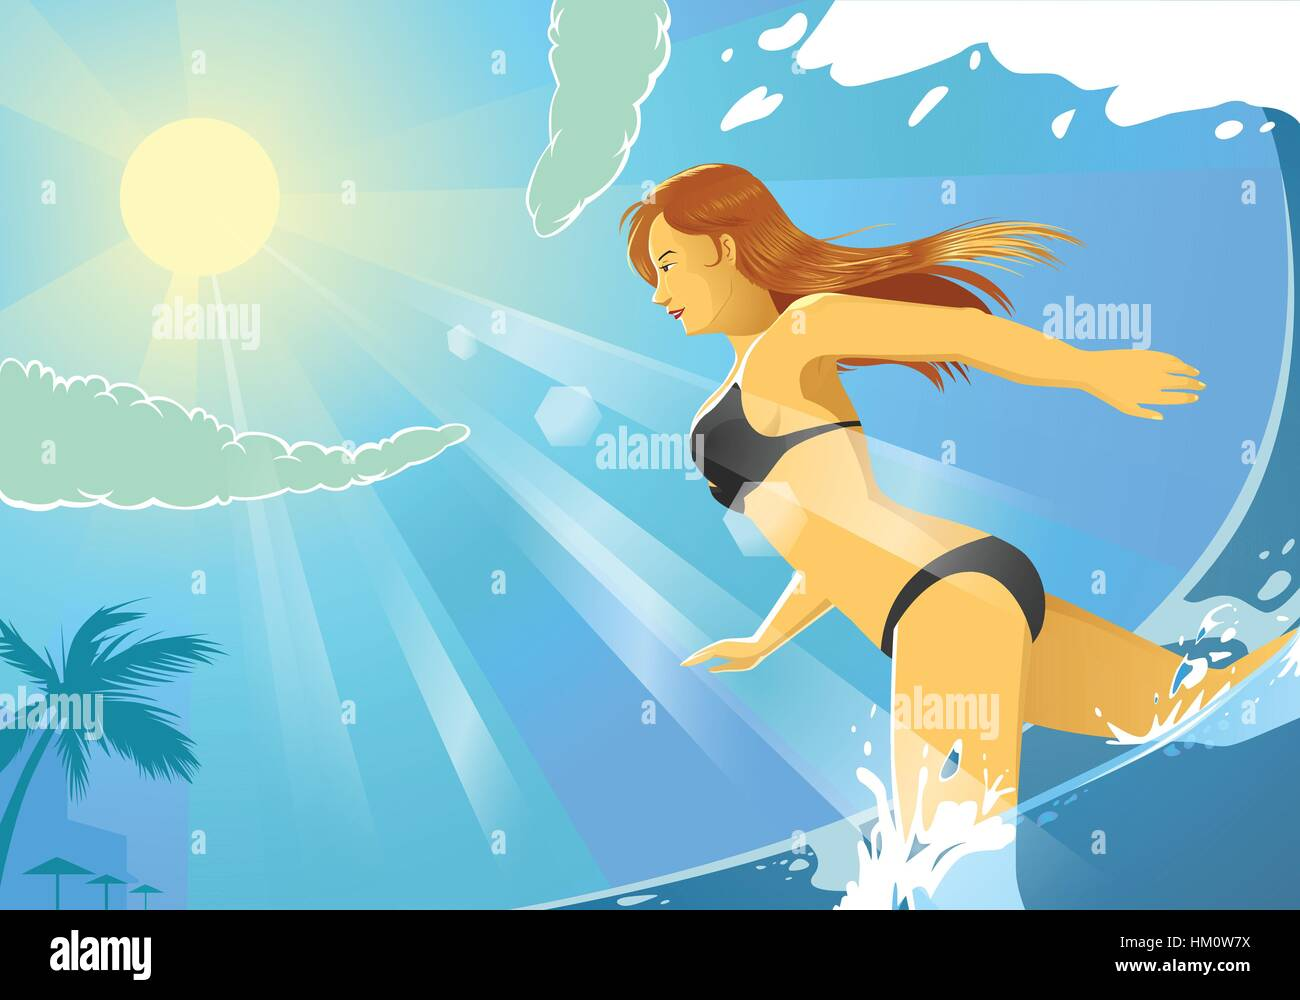 a vector illustration of a bikini girl running on the beach - Stock Vector